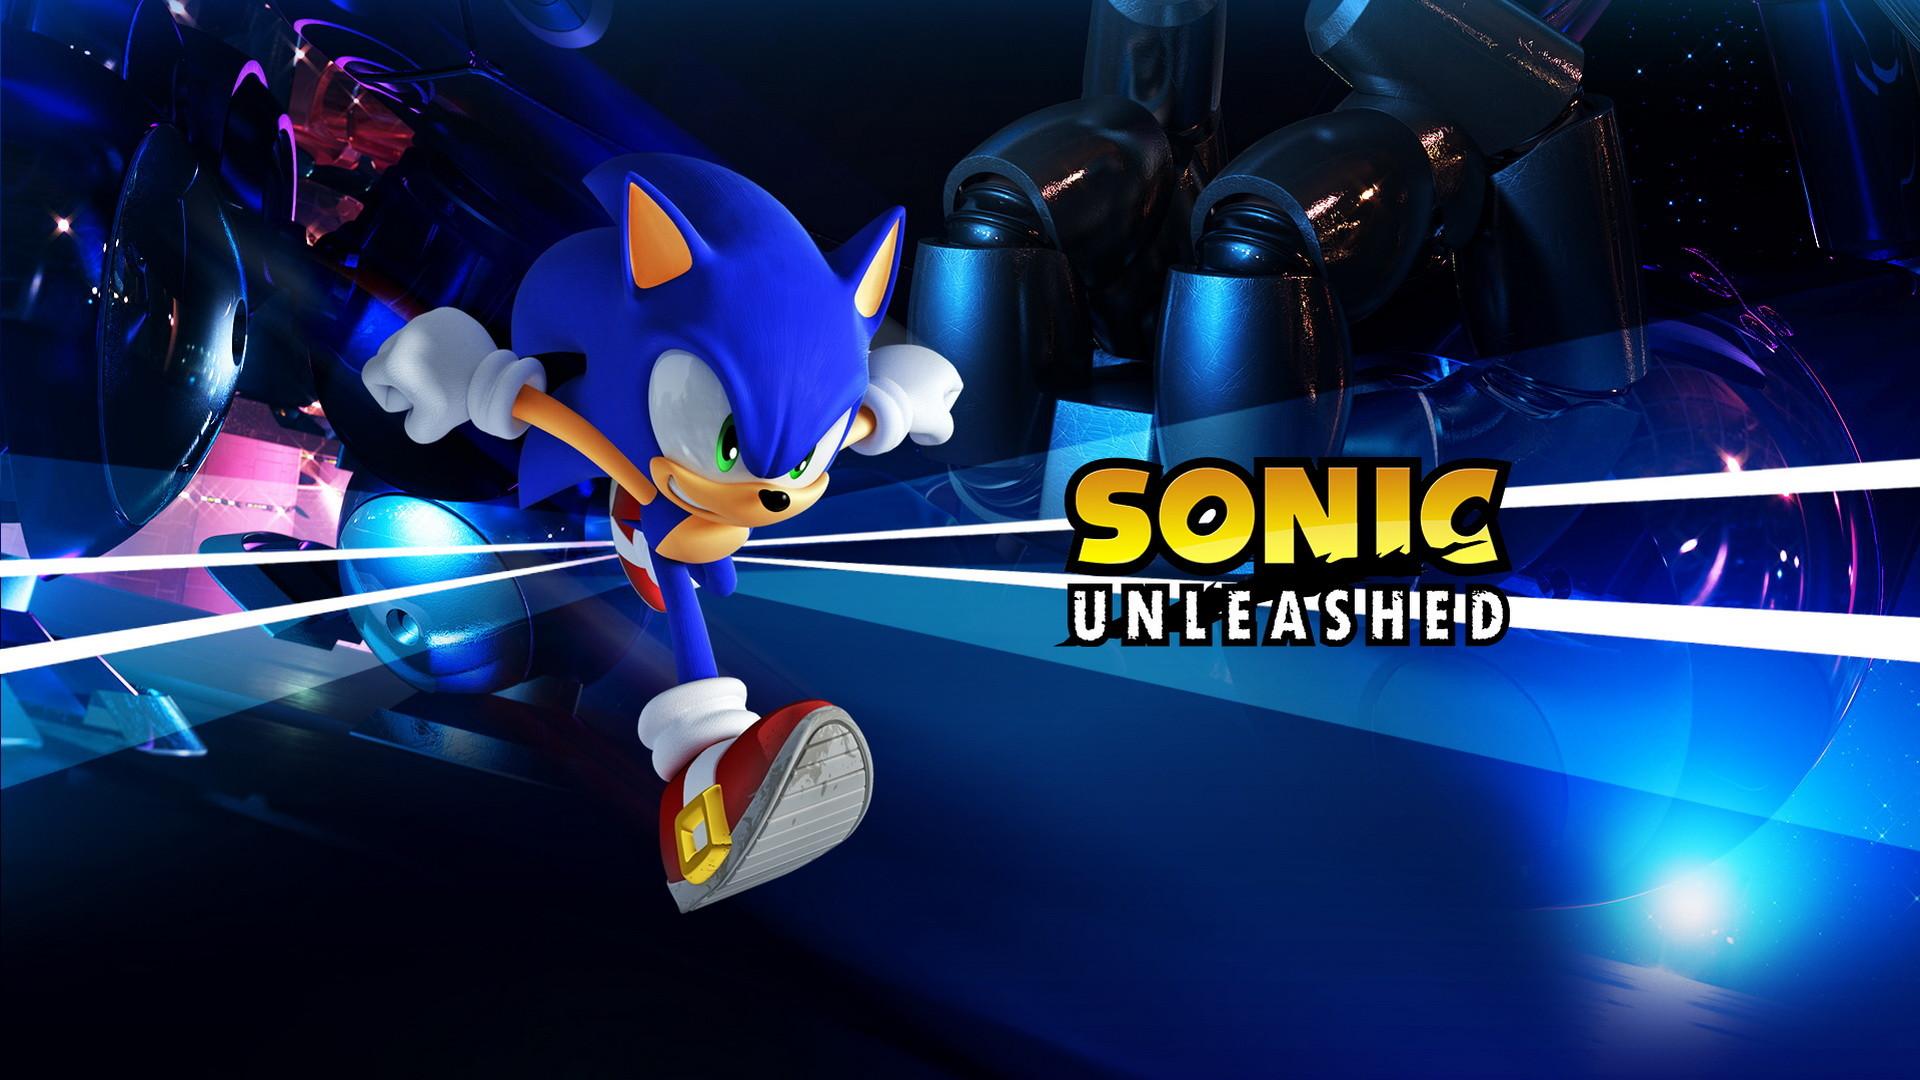 Sonic The Hedgehog Backgrounds High Quality   PixelsTalk.Net